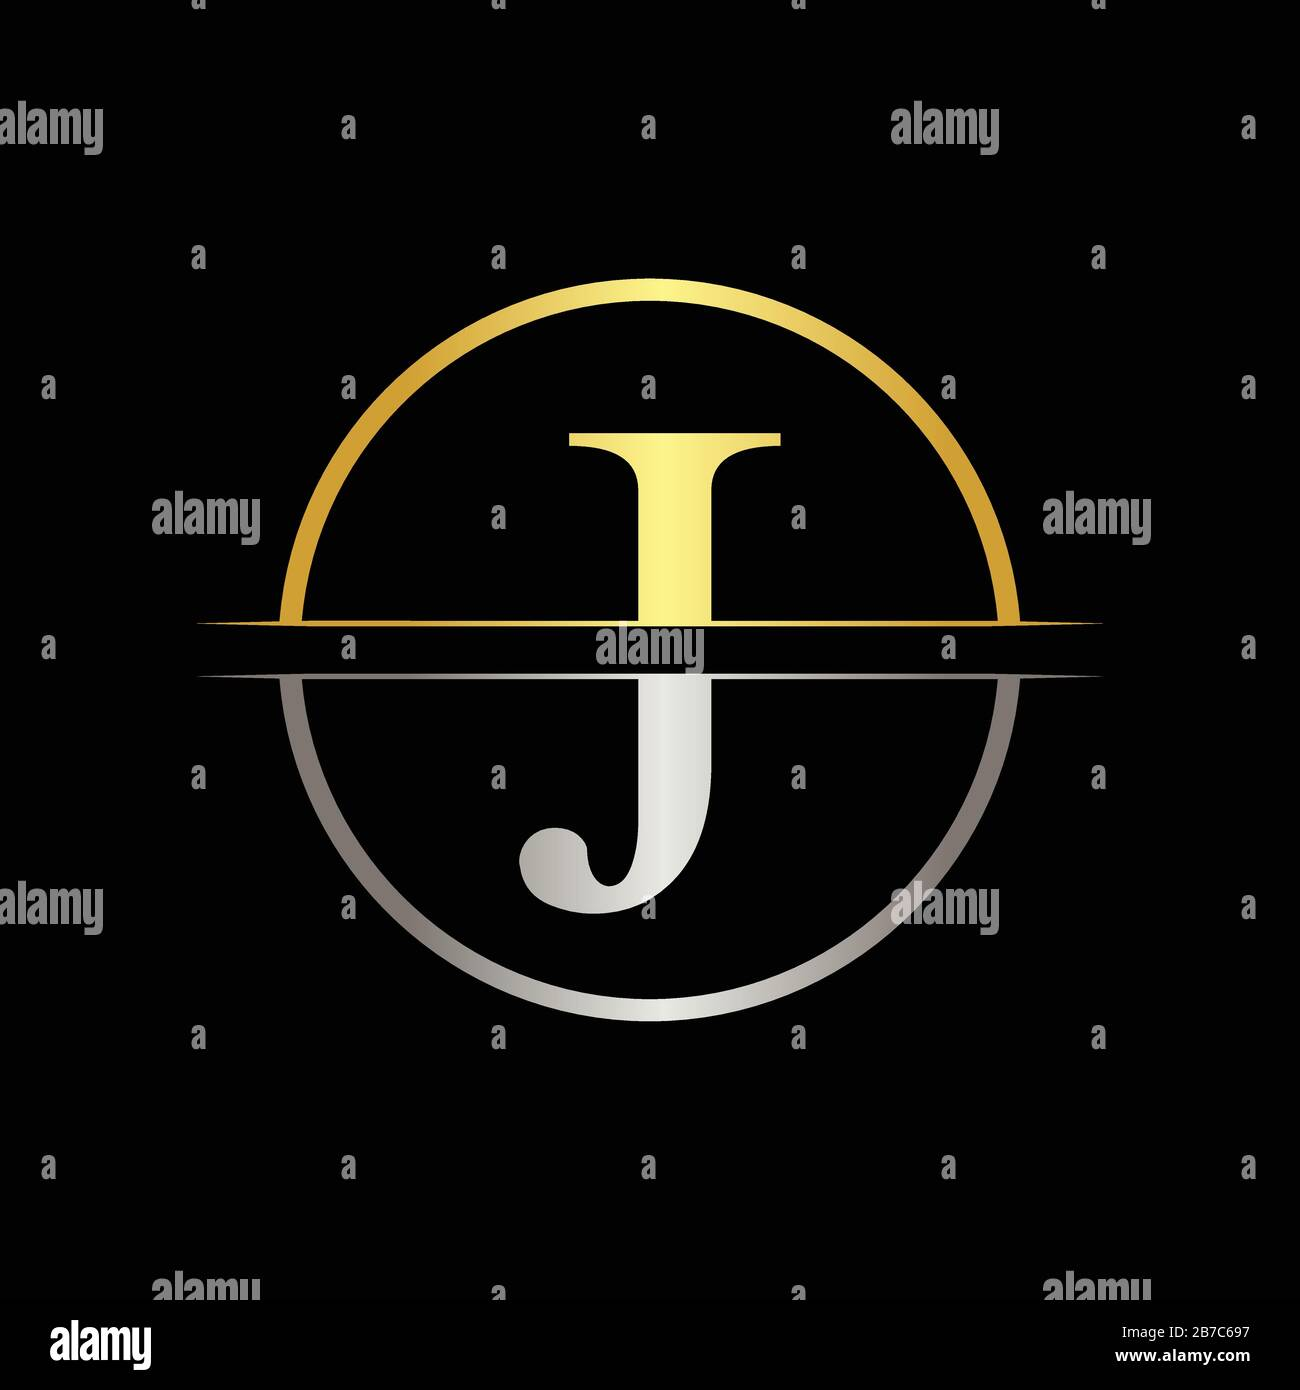 Initial Letter J Logo Design Business Vector Template Creative Abstract Letter J Logo Vector Stock Vector Image Art Alamy